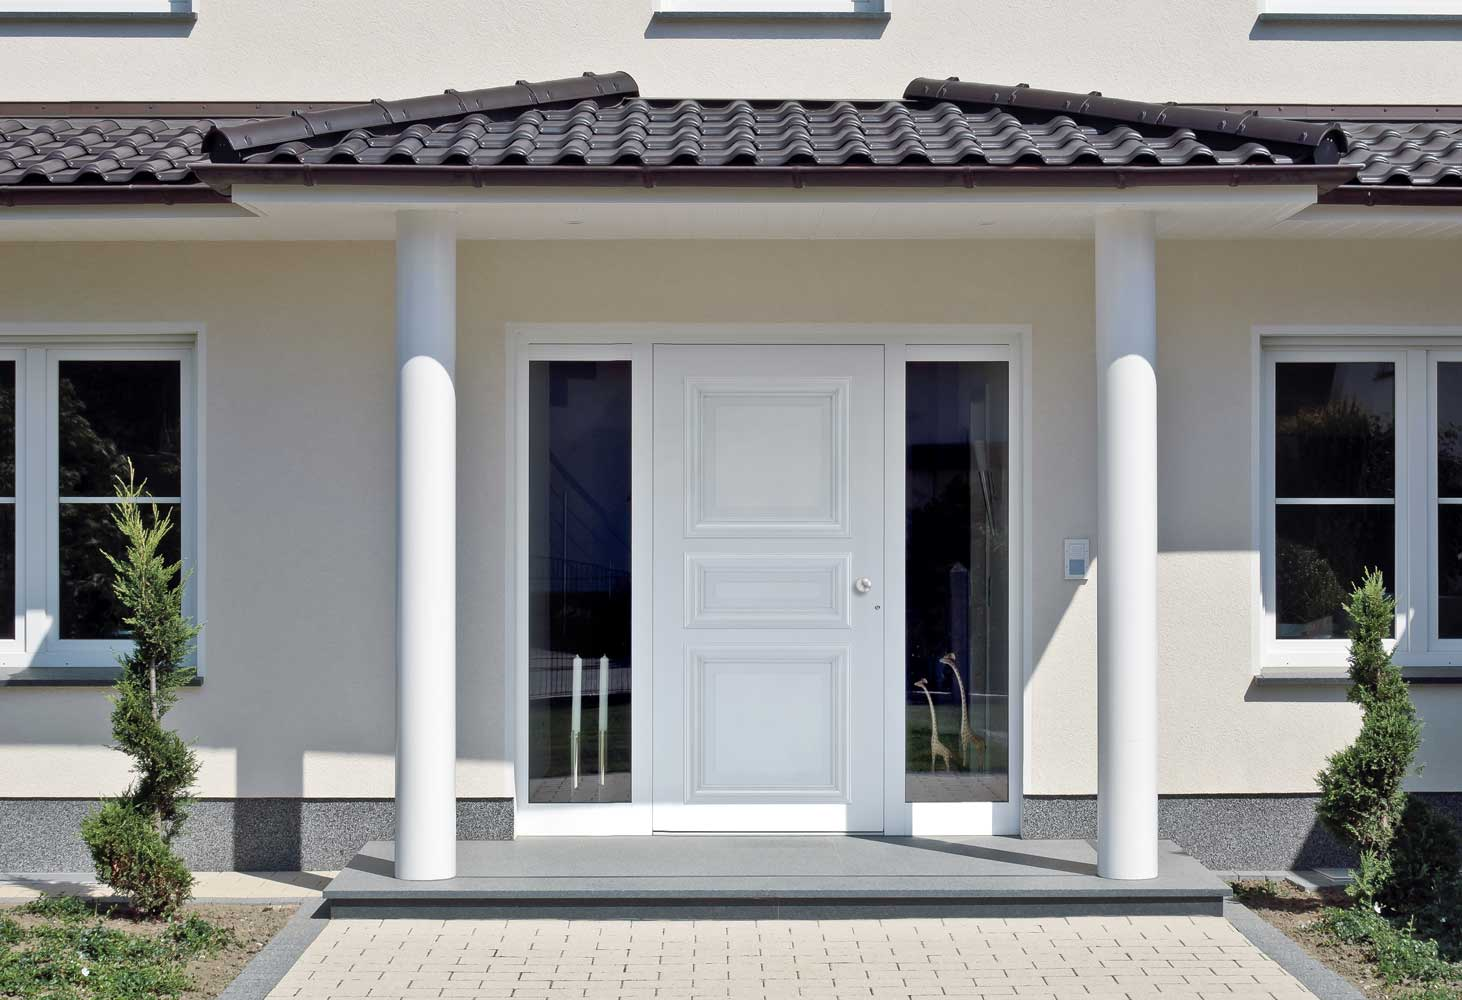 Bruxells Villa white Schuco front door with side panels